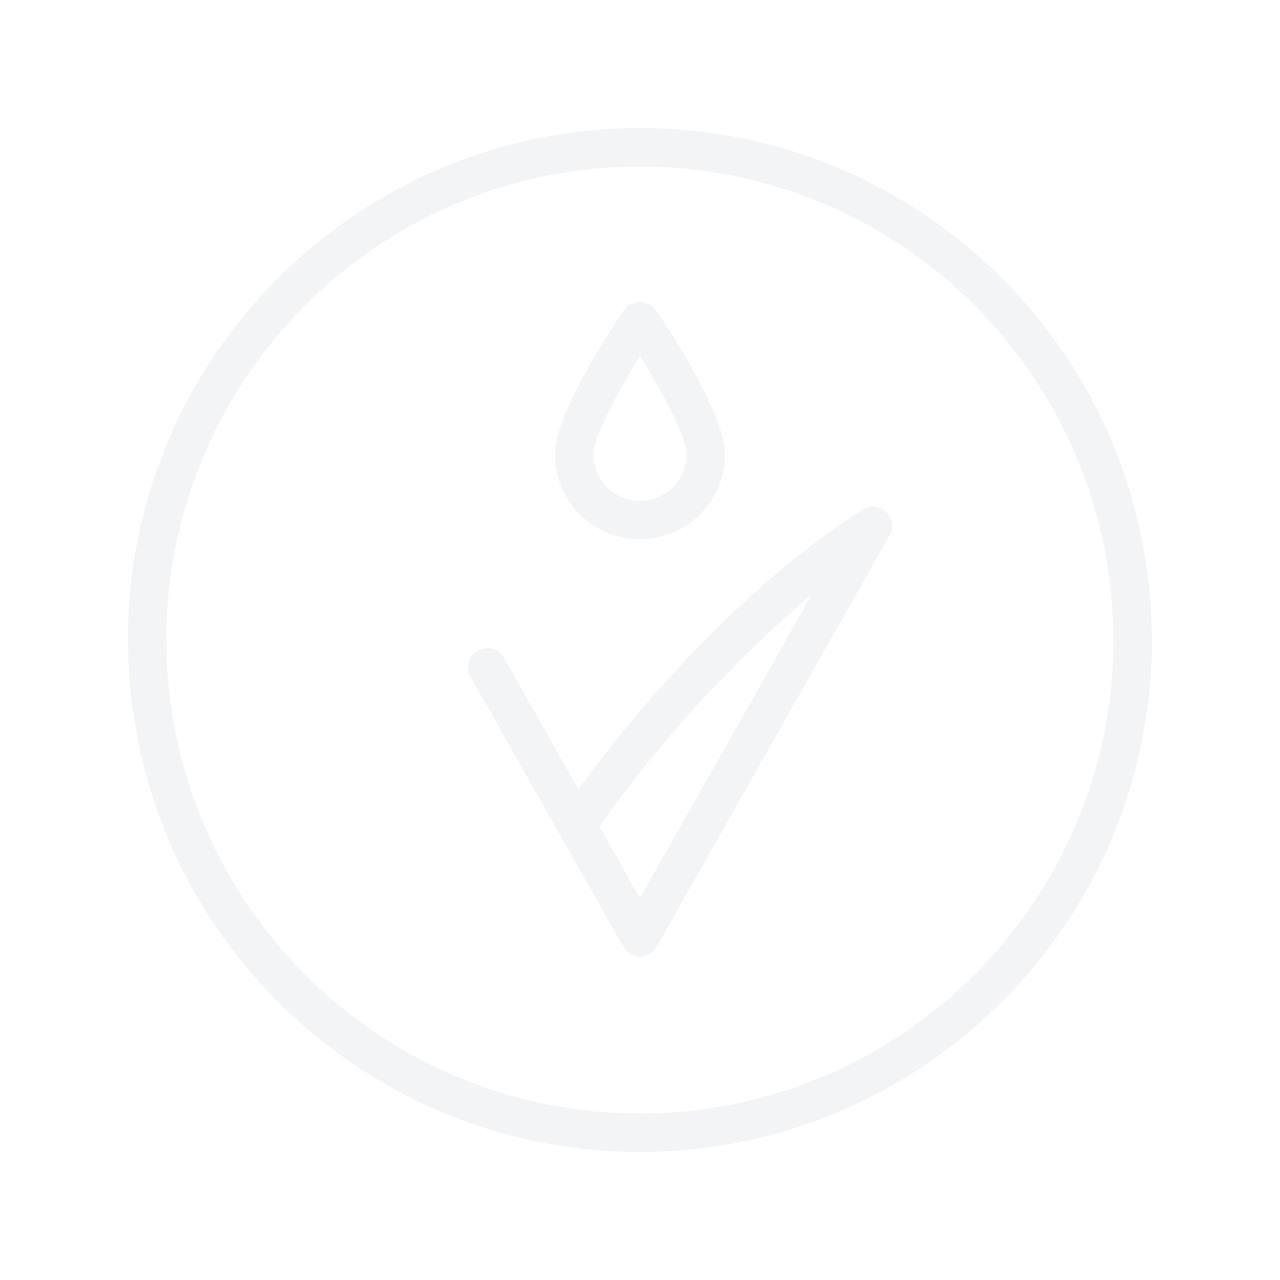 MAYBELLINE Color Sensational Shaping Lip Liner No.10 Nude Whisper 0.28g